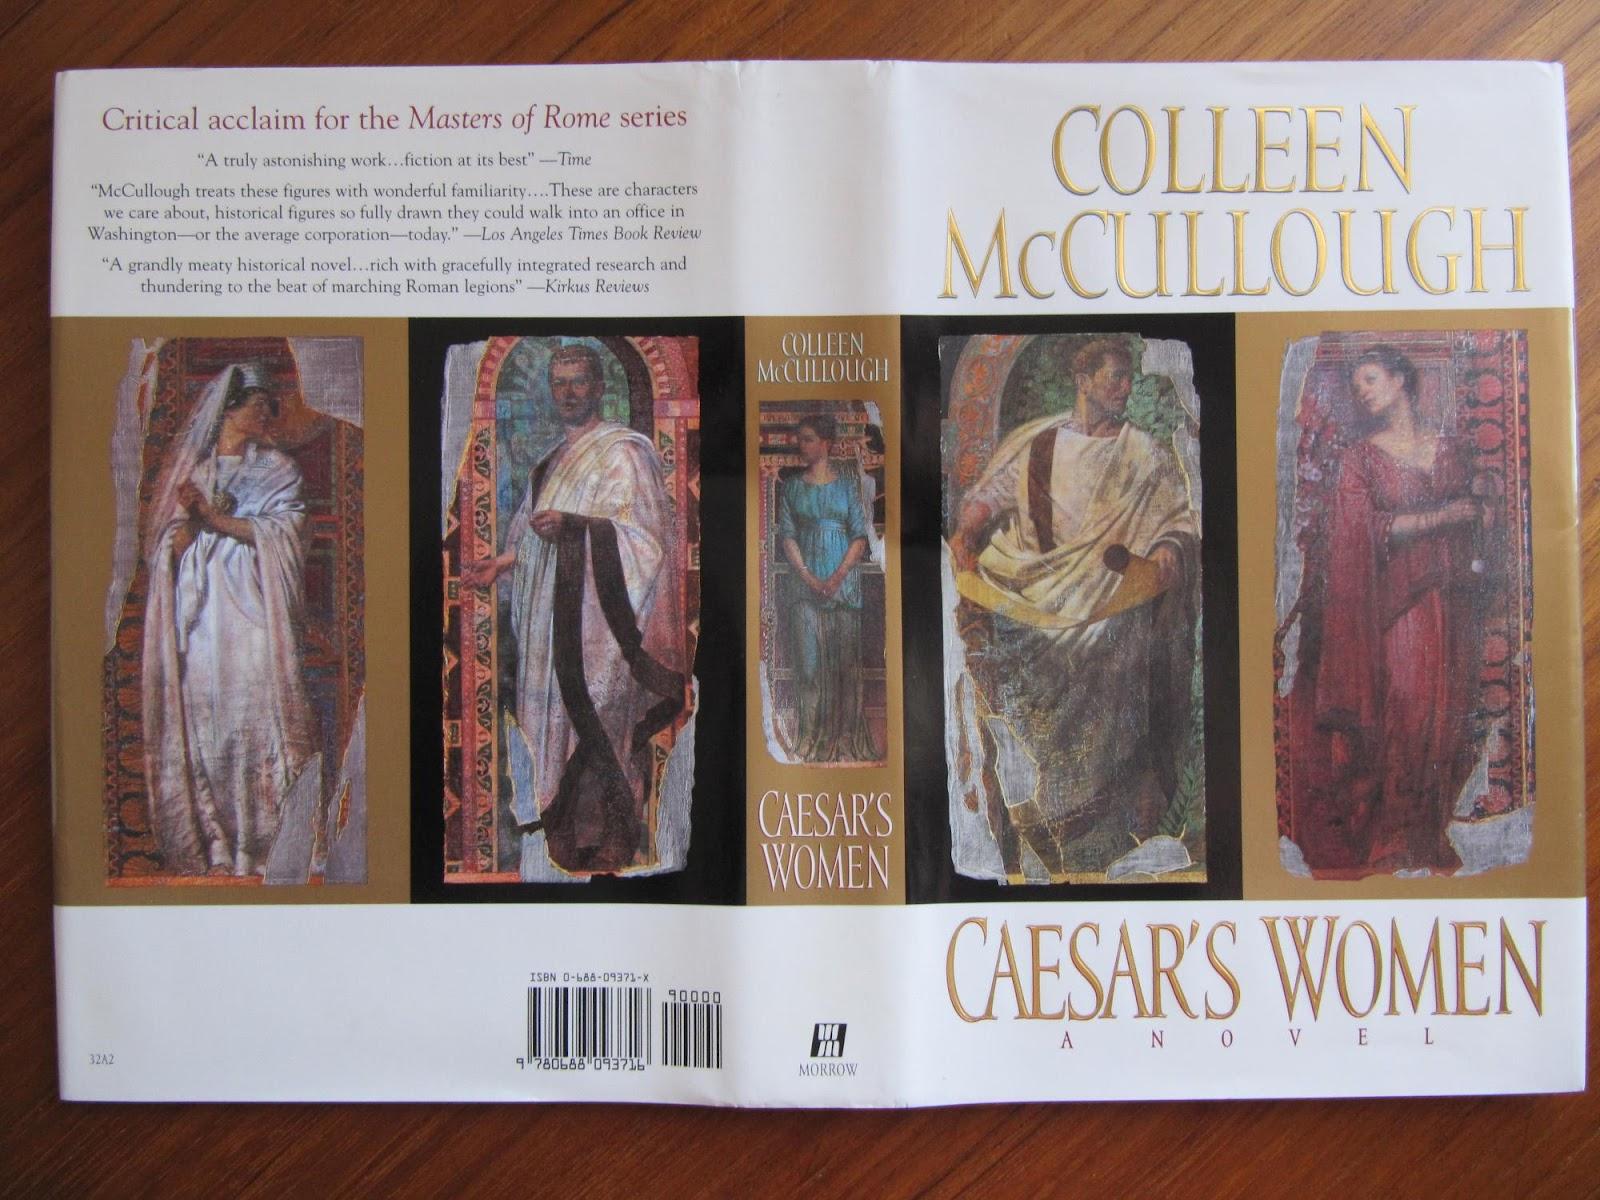 caesar's women.jpg